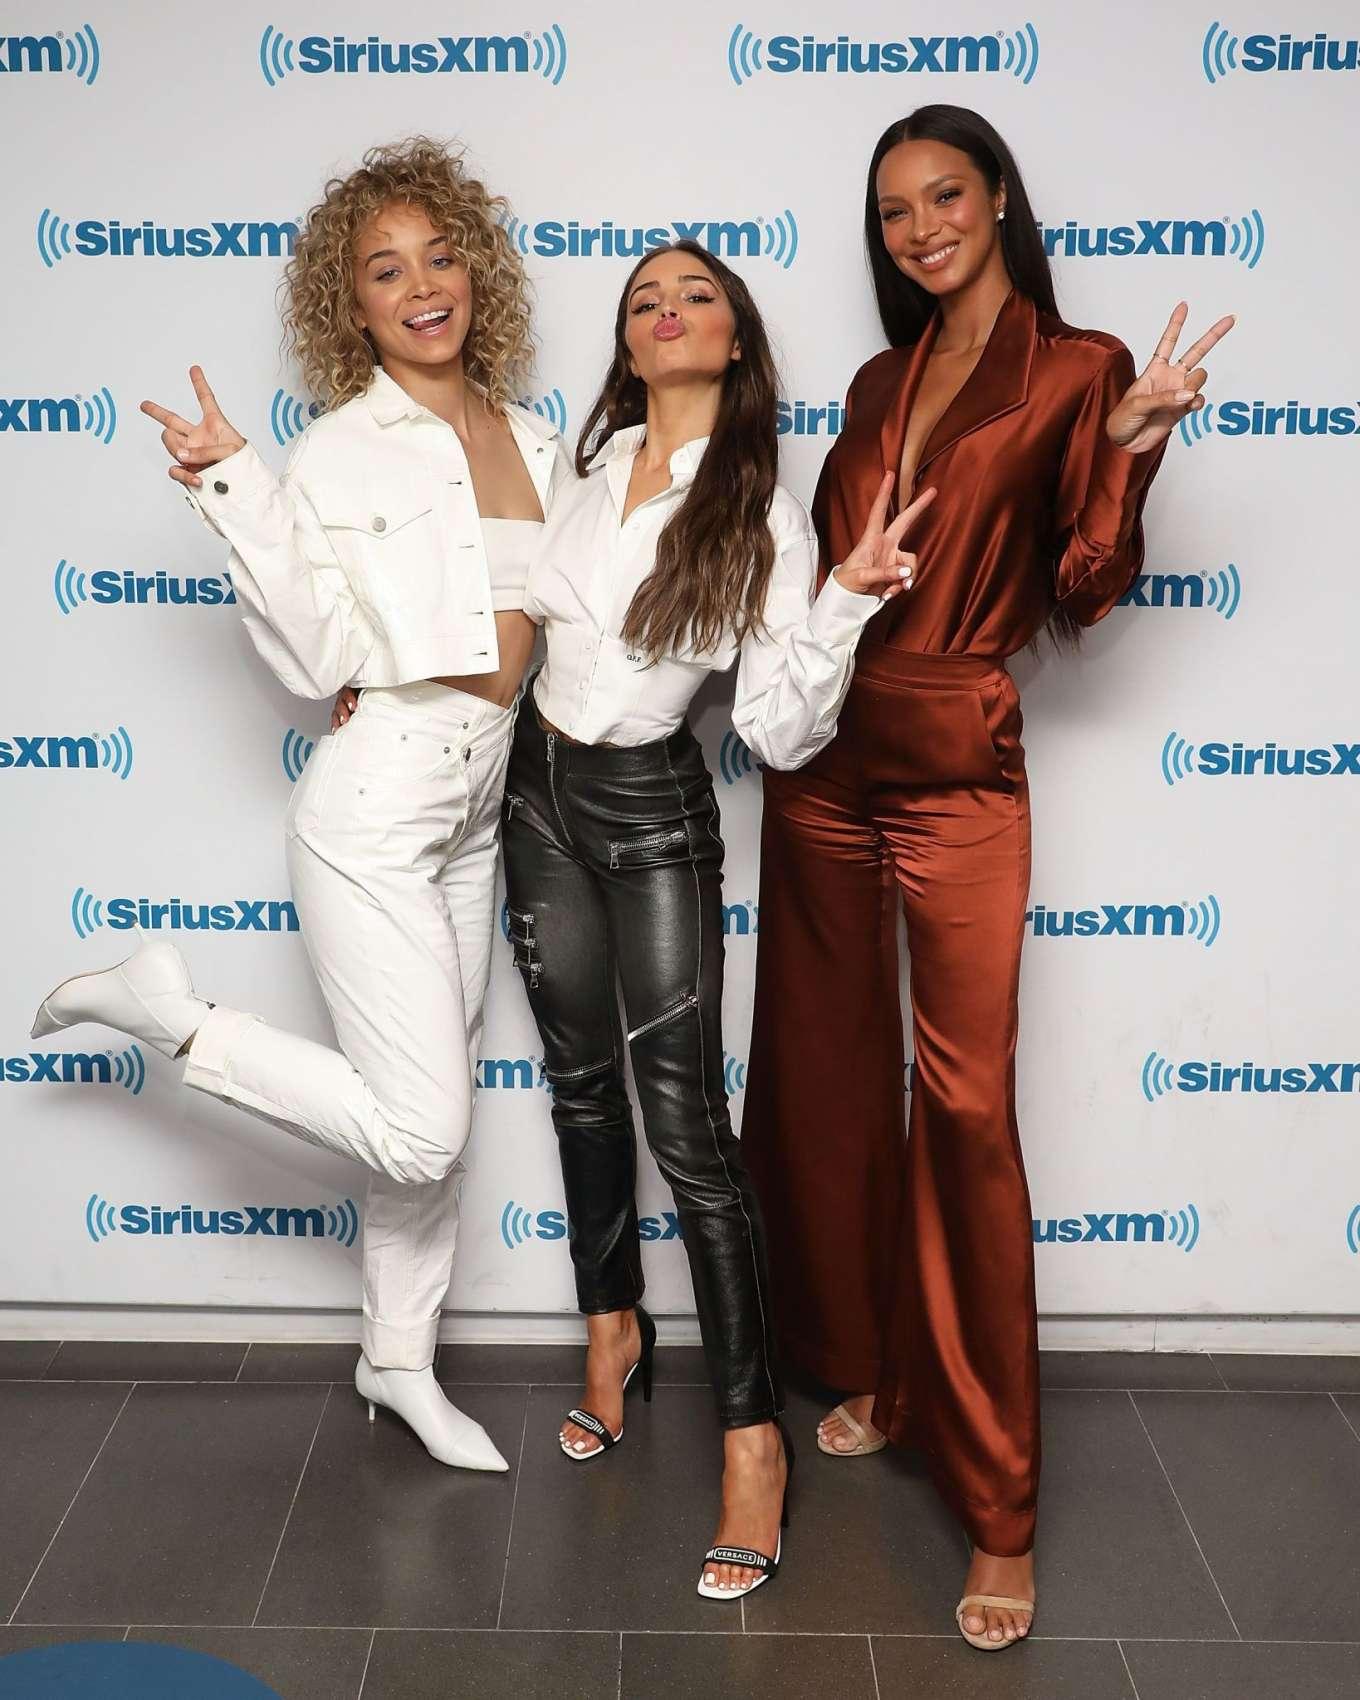 Jasmine Sanders 2019 : Jasmine Sanders Lais Ribeiro and Olivia Culpo: Visit the SiriusXM Studios -07